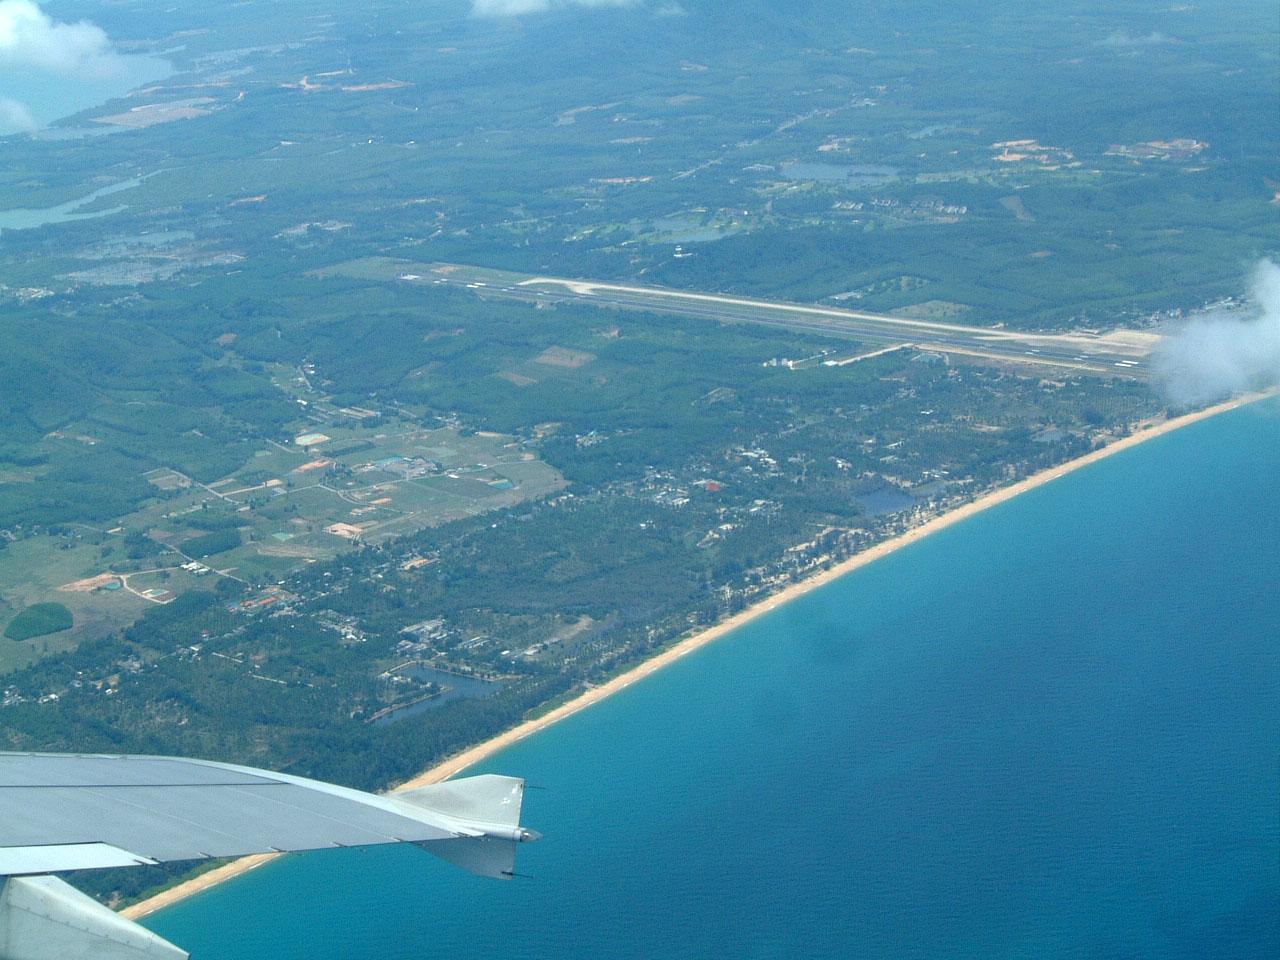 Thailand Aerial view of Phuket International Airport Apr 2003 01